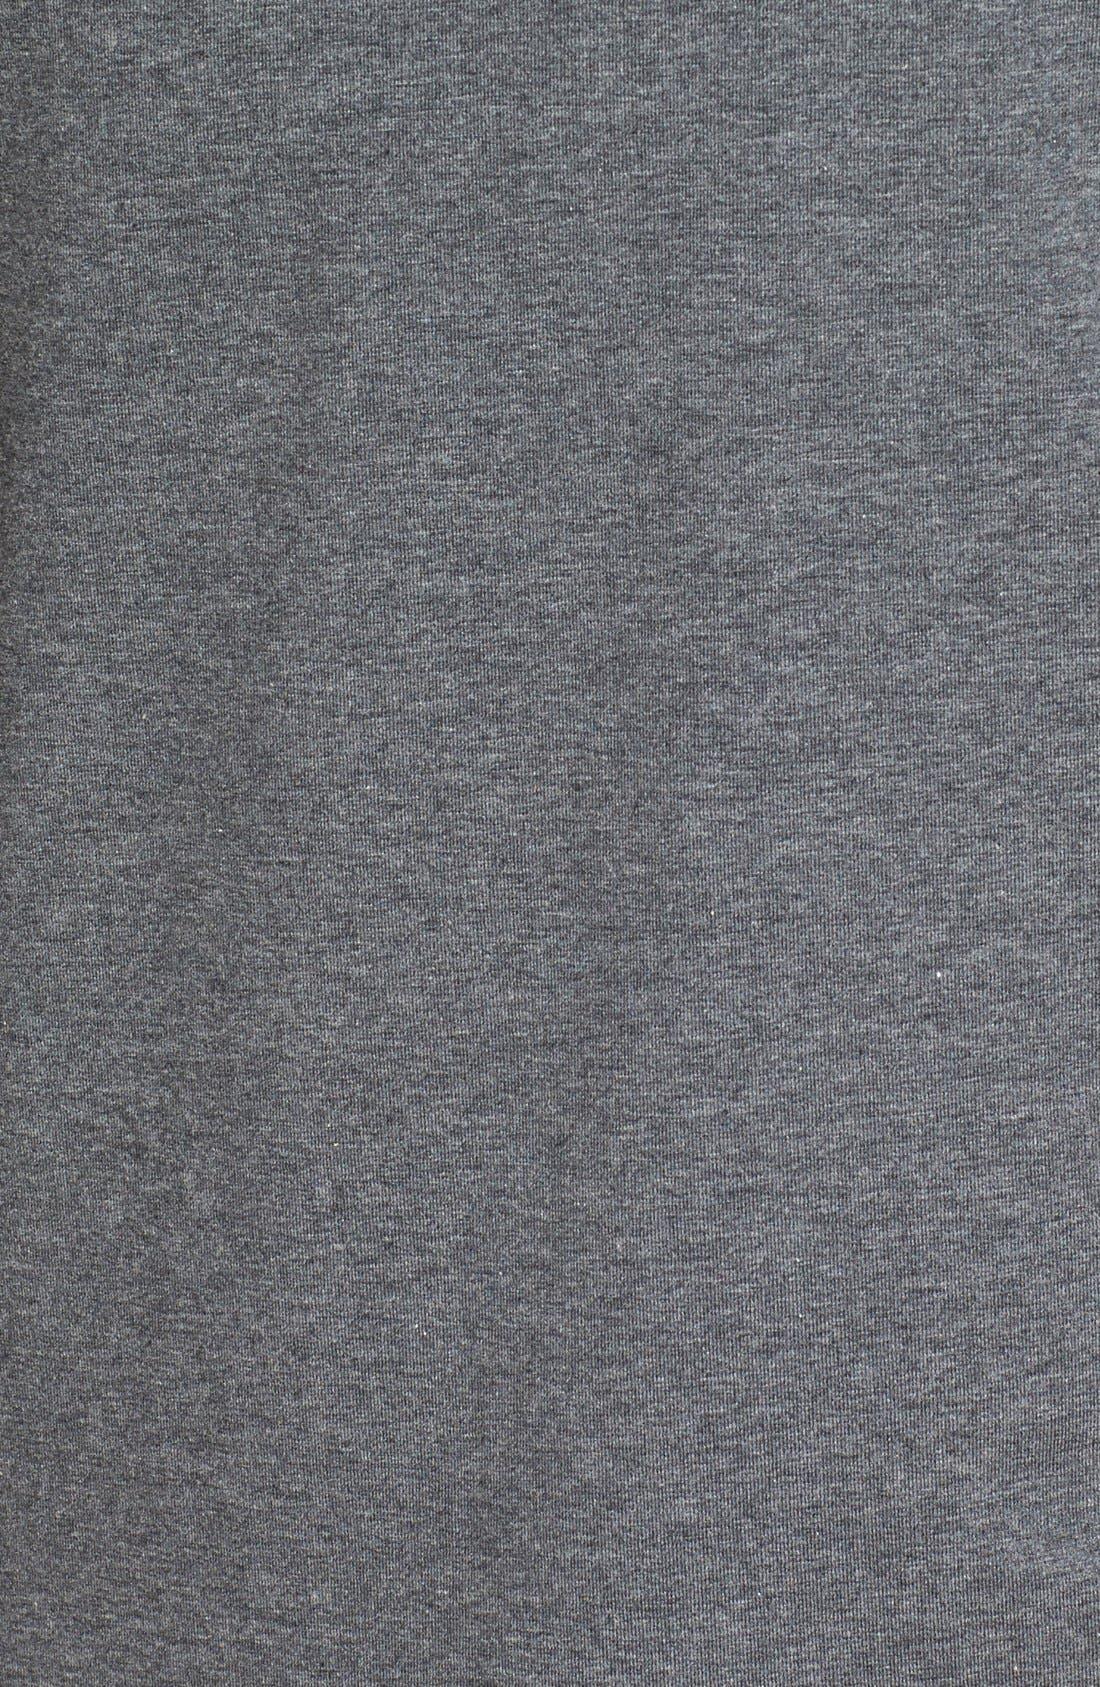 Long Sleeve Turtleneck T-Shirt,                             Alternate thumbnail 5, color,                             Charcoal